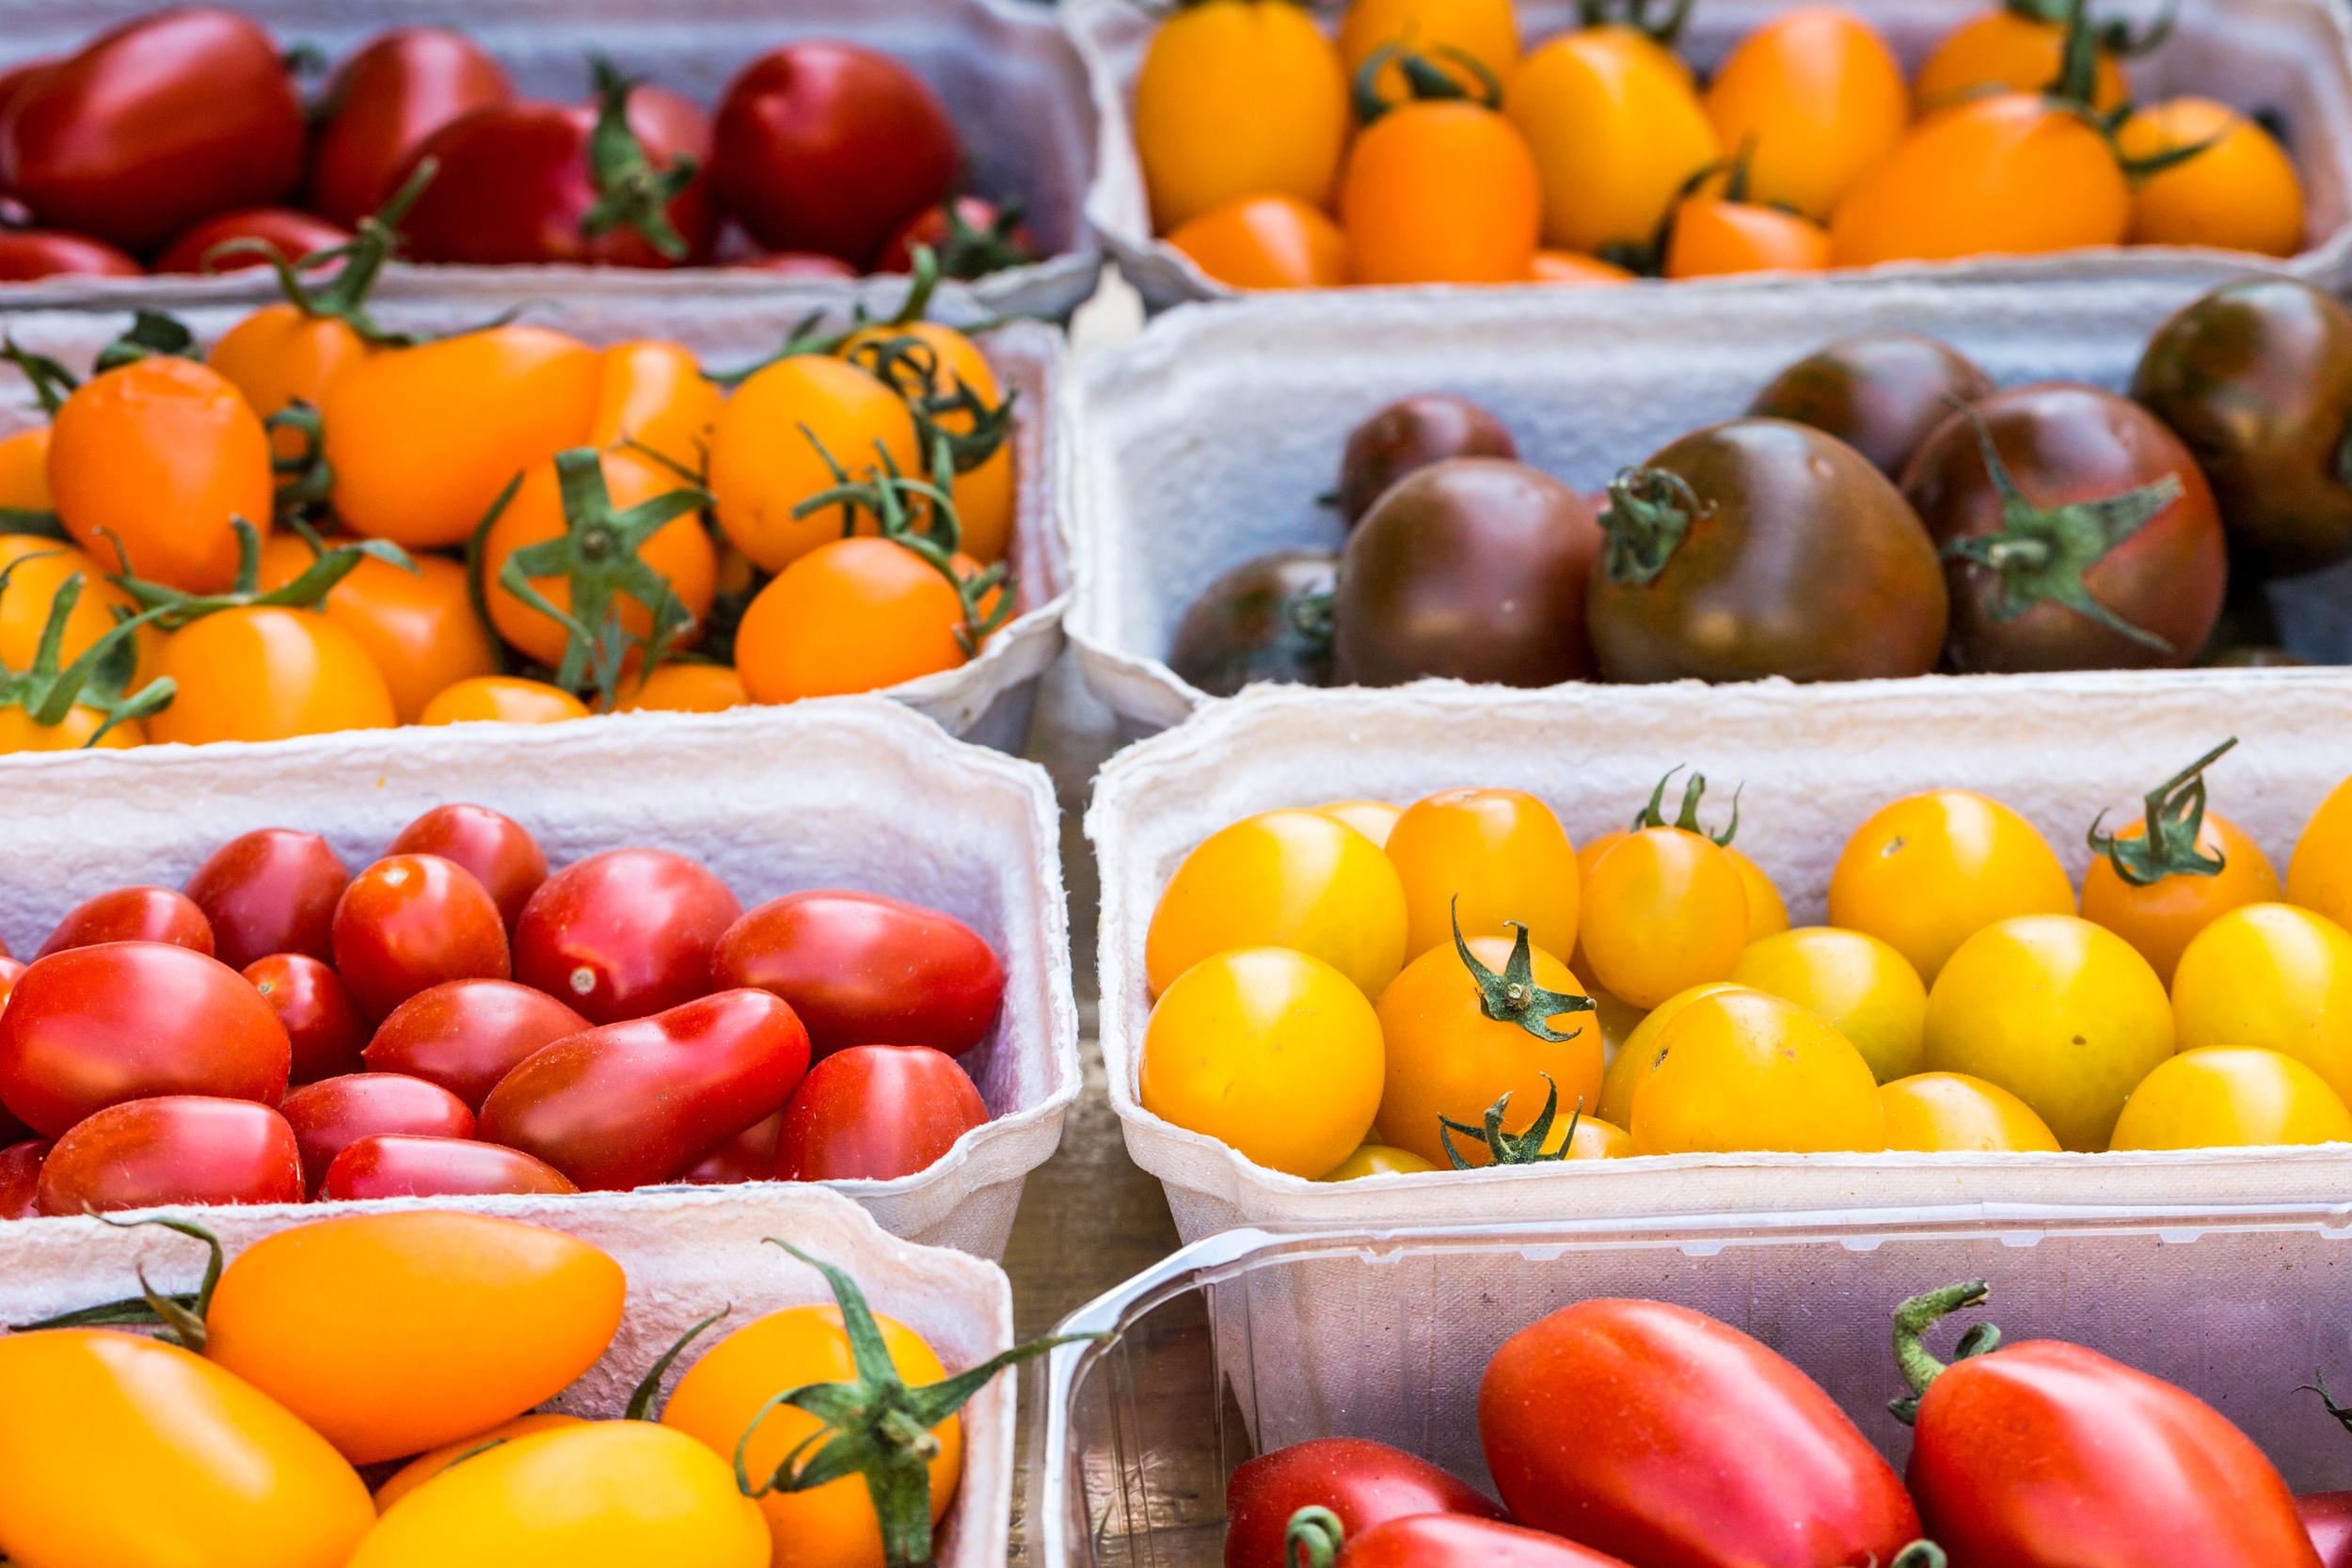 Tomatoes in baskets.jpg